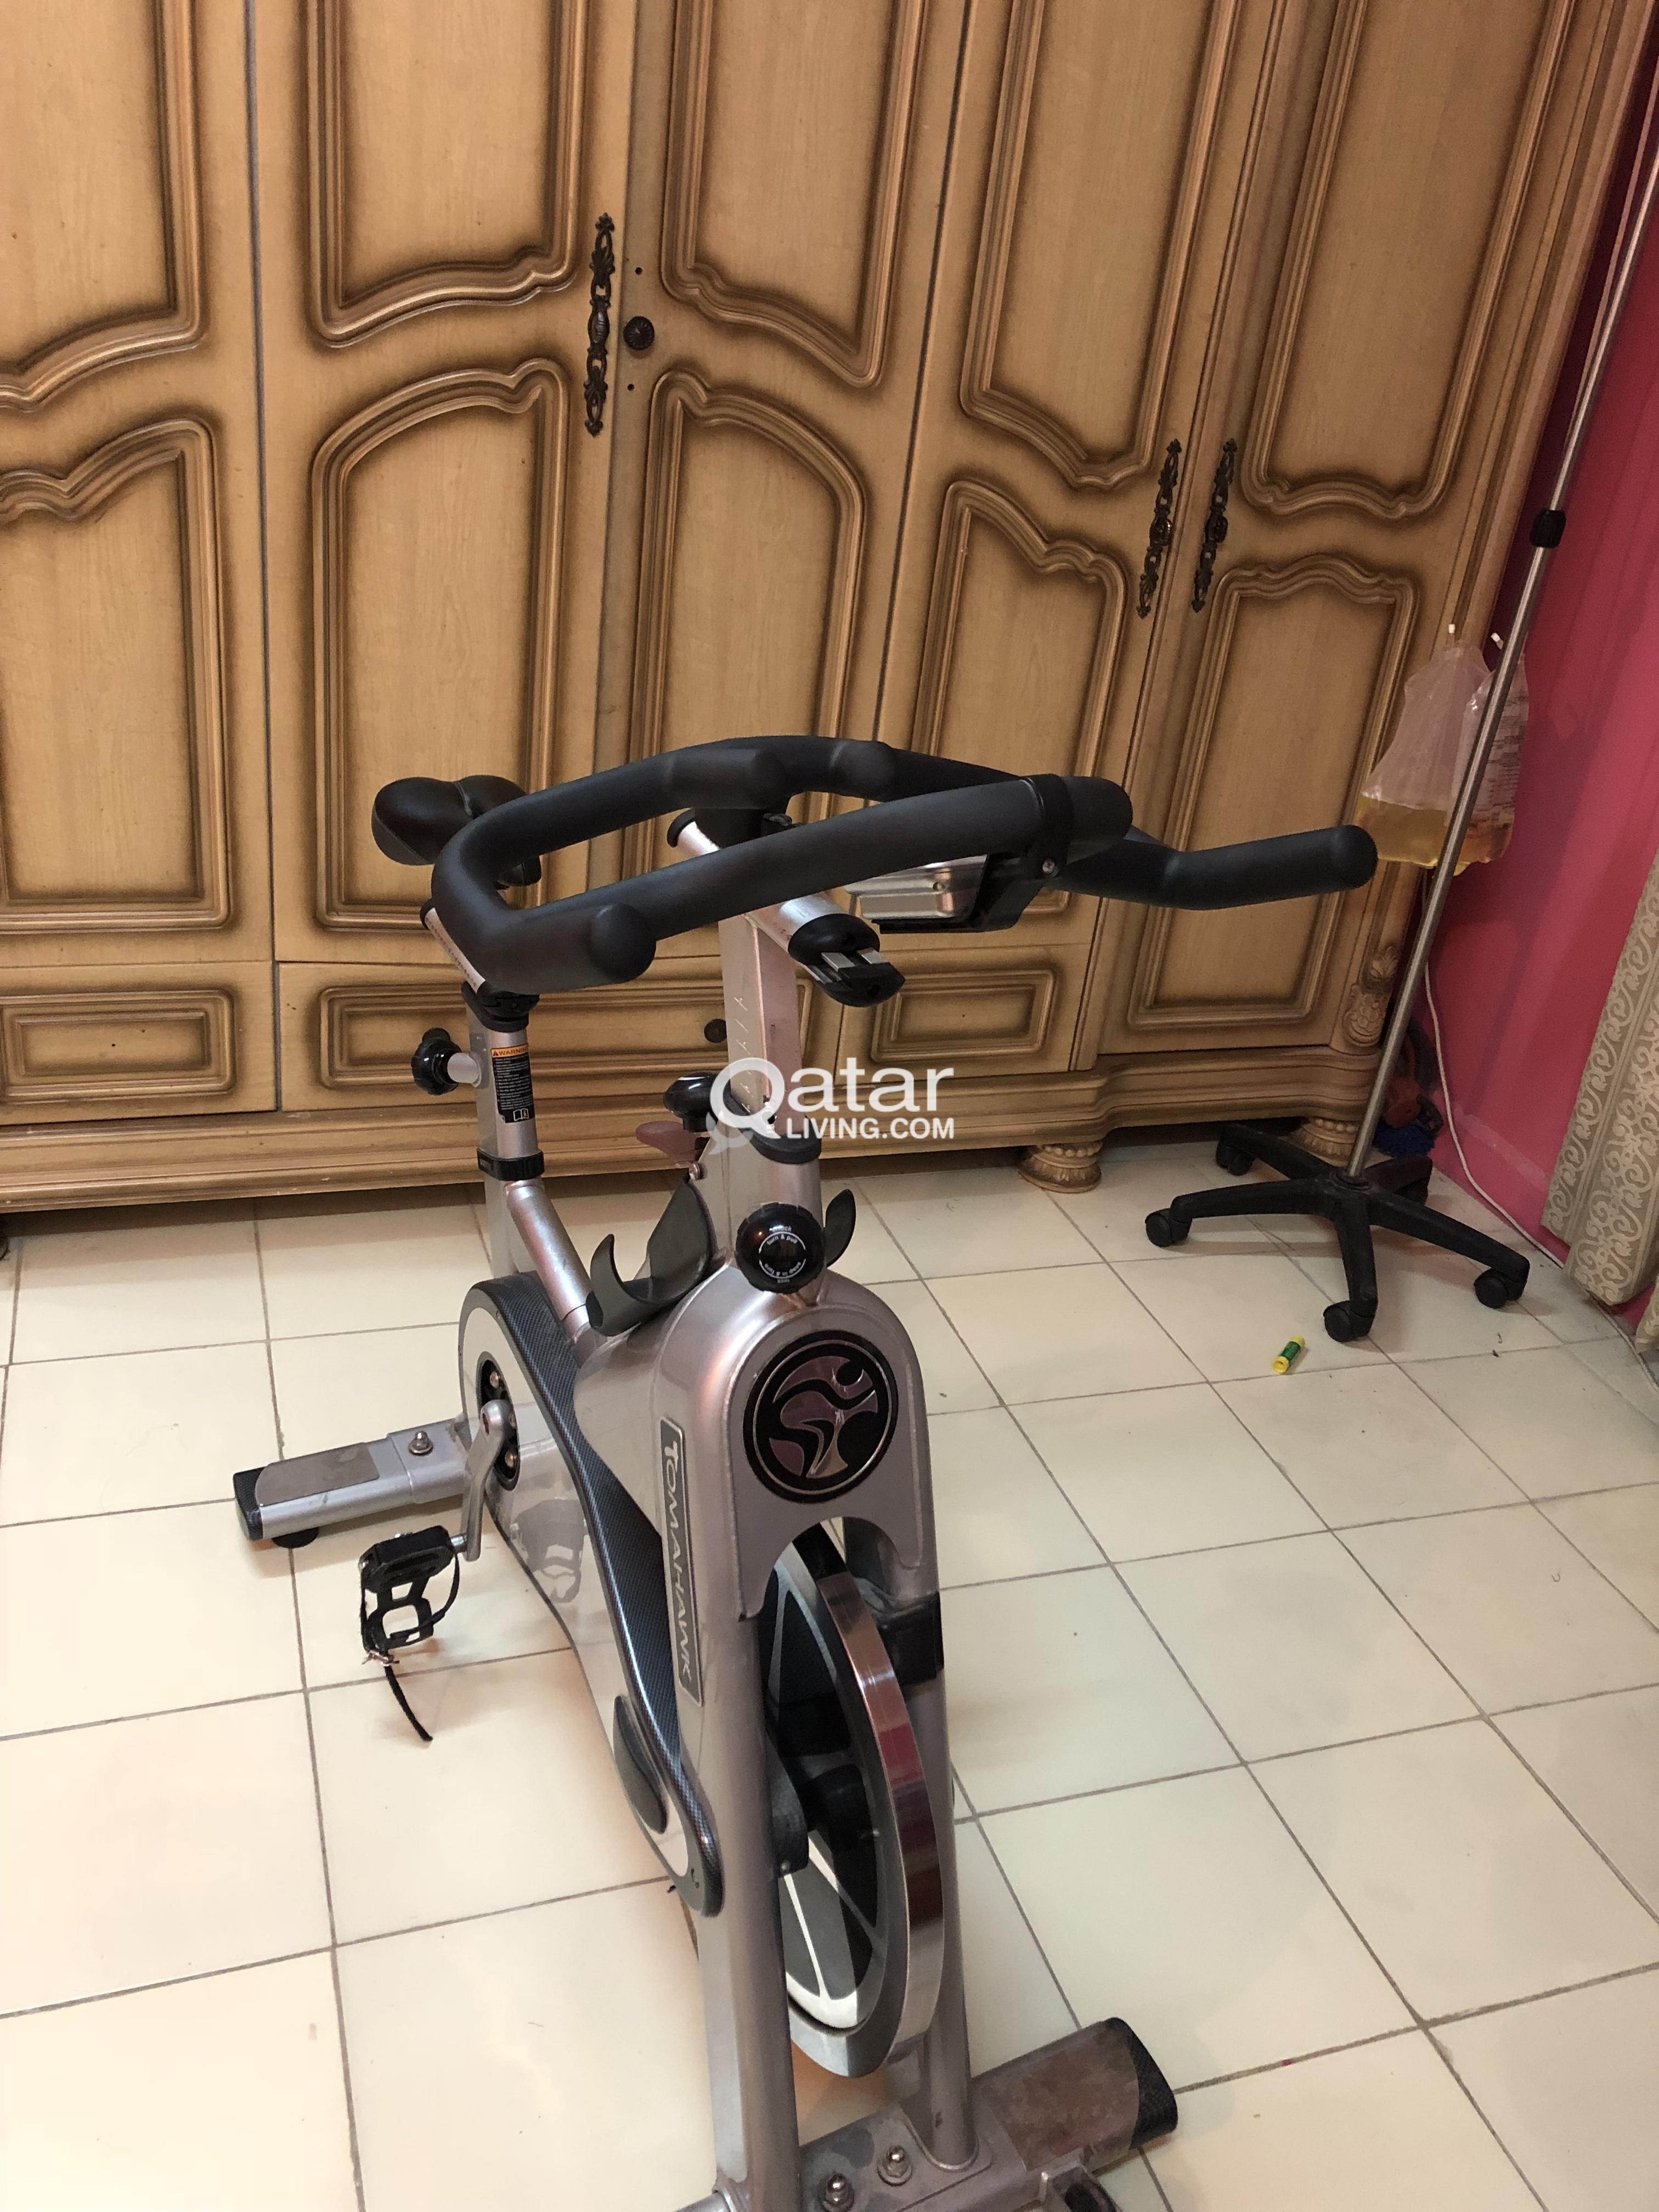 Spin bike | Qatar Living